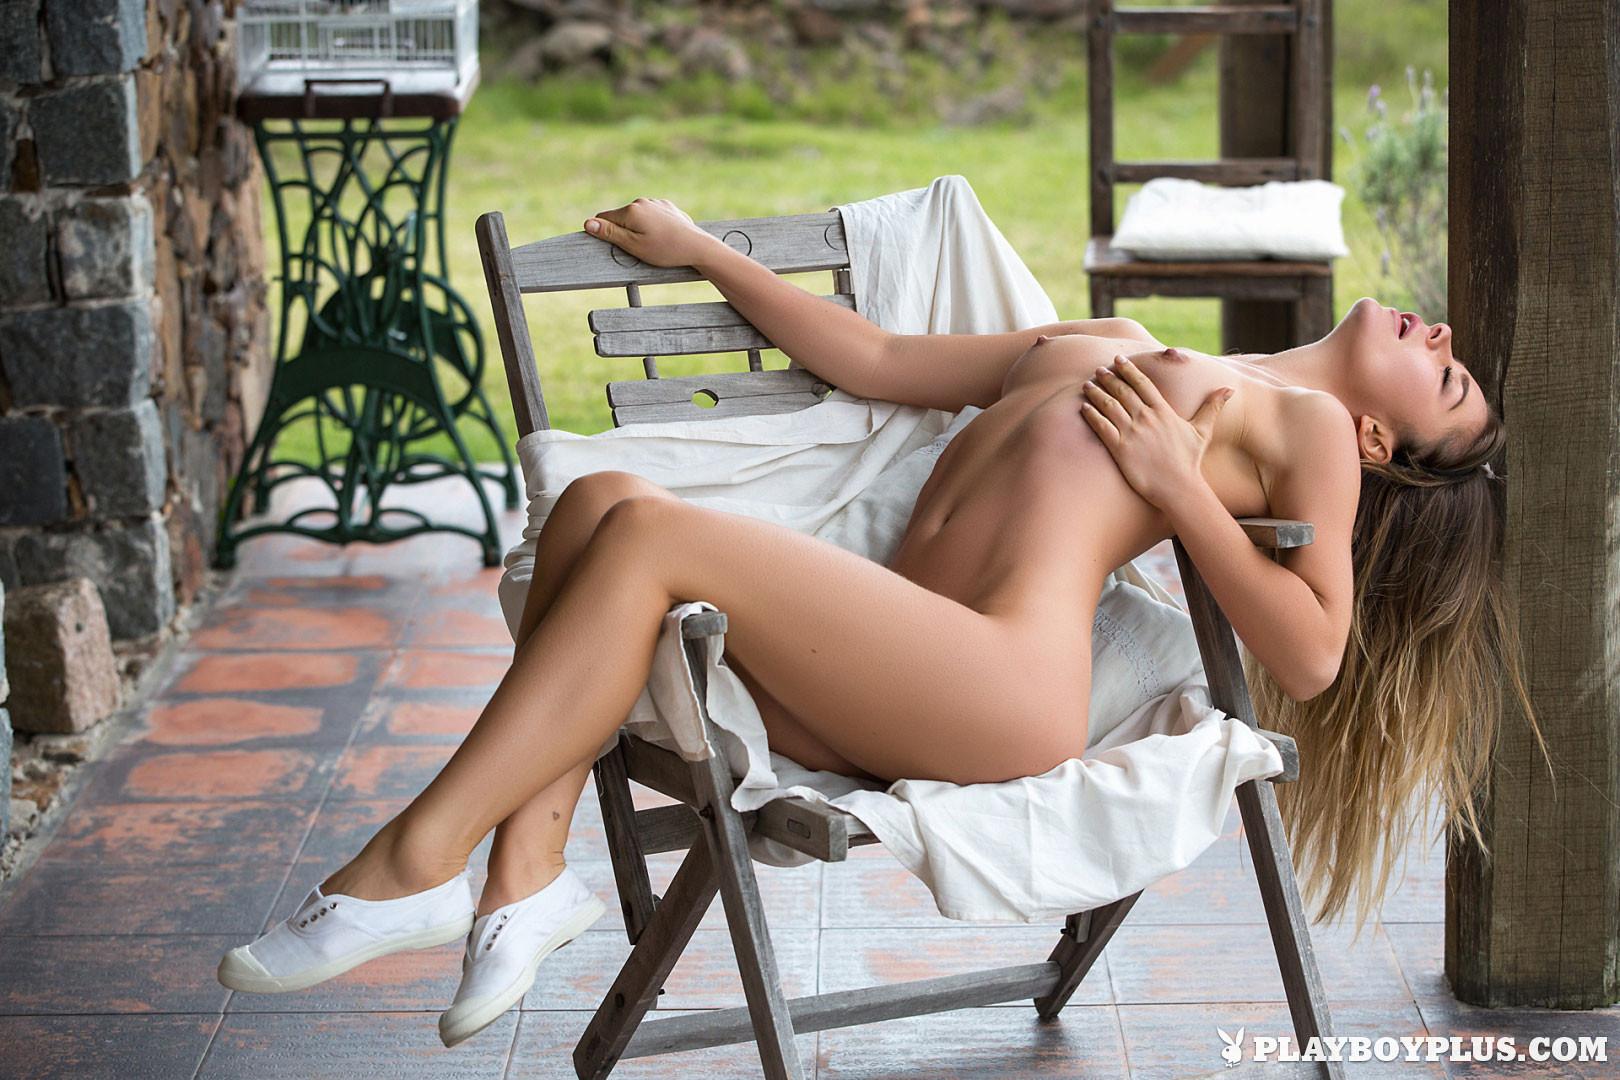 Lilii Playboy Ccybergirl Nude